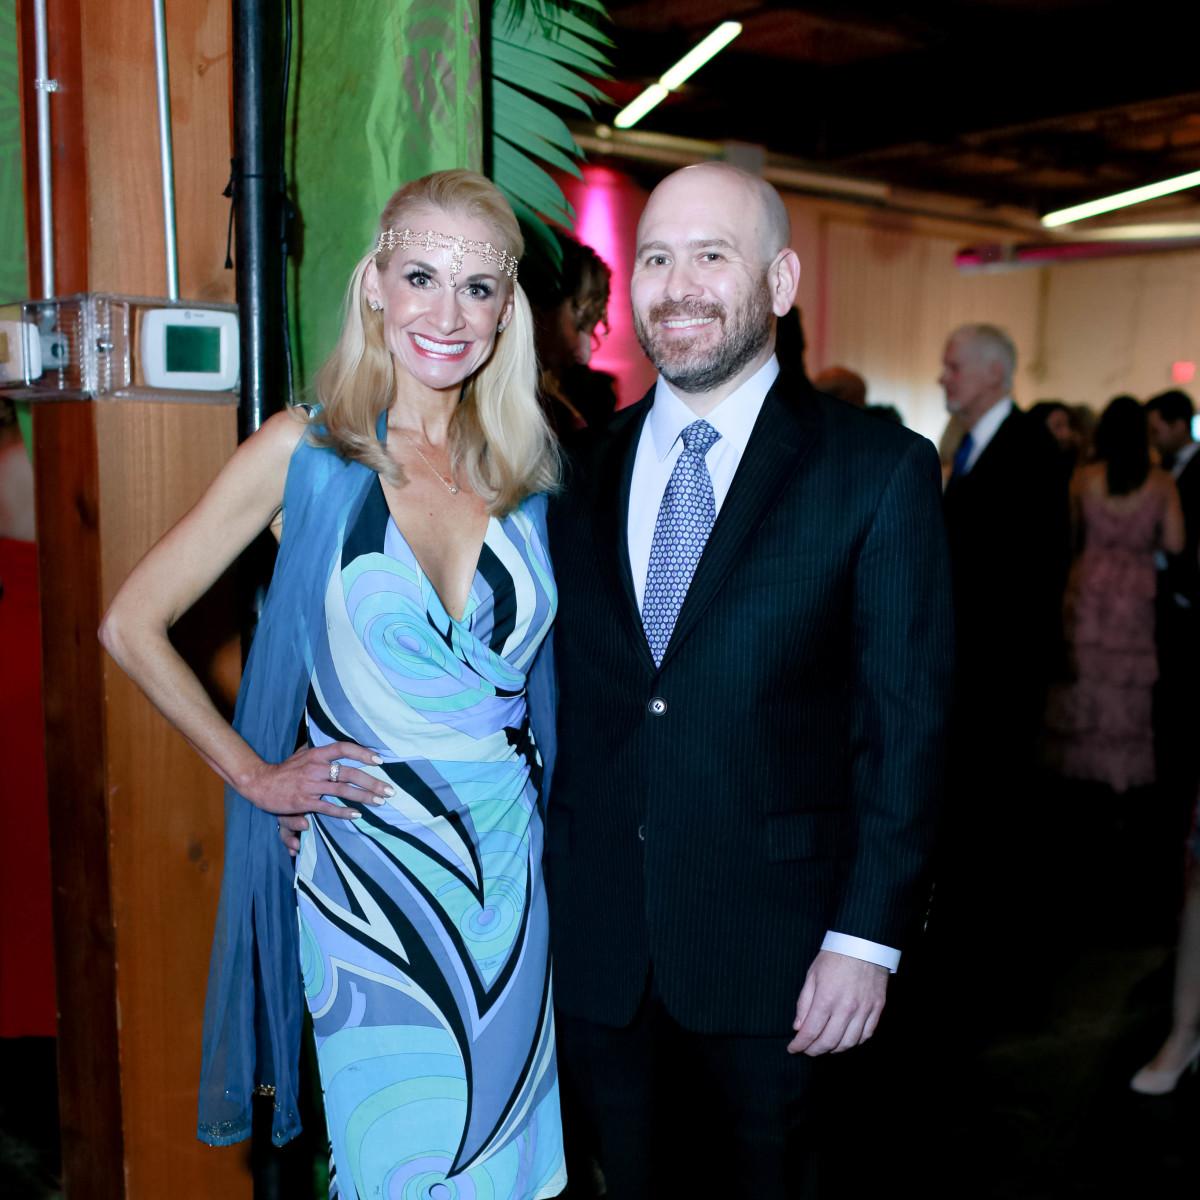 Maggie Kipp and Jack Pratt